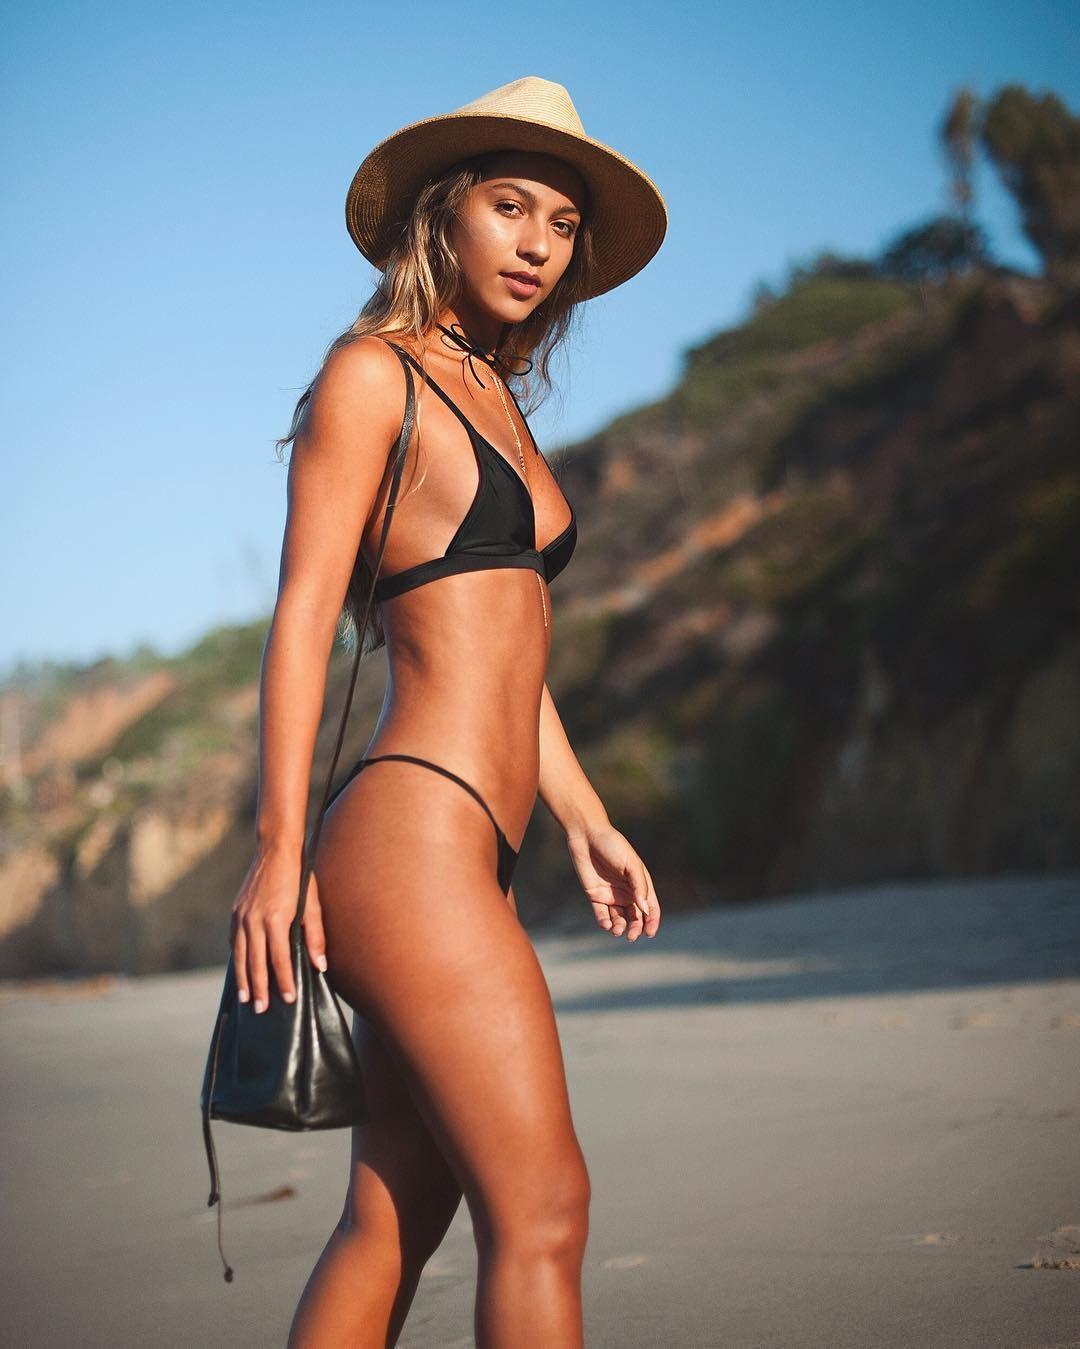 Cleavage Erika Wheaton nude photos 2019